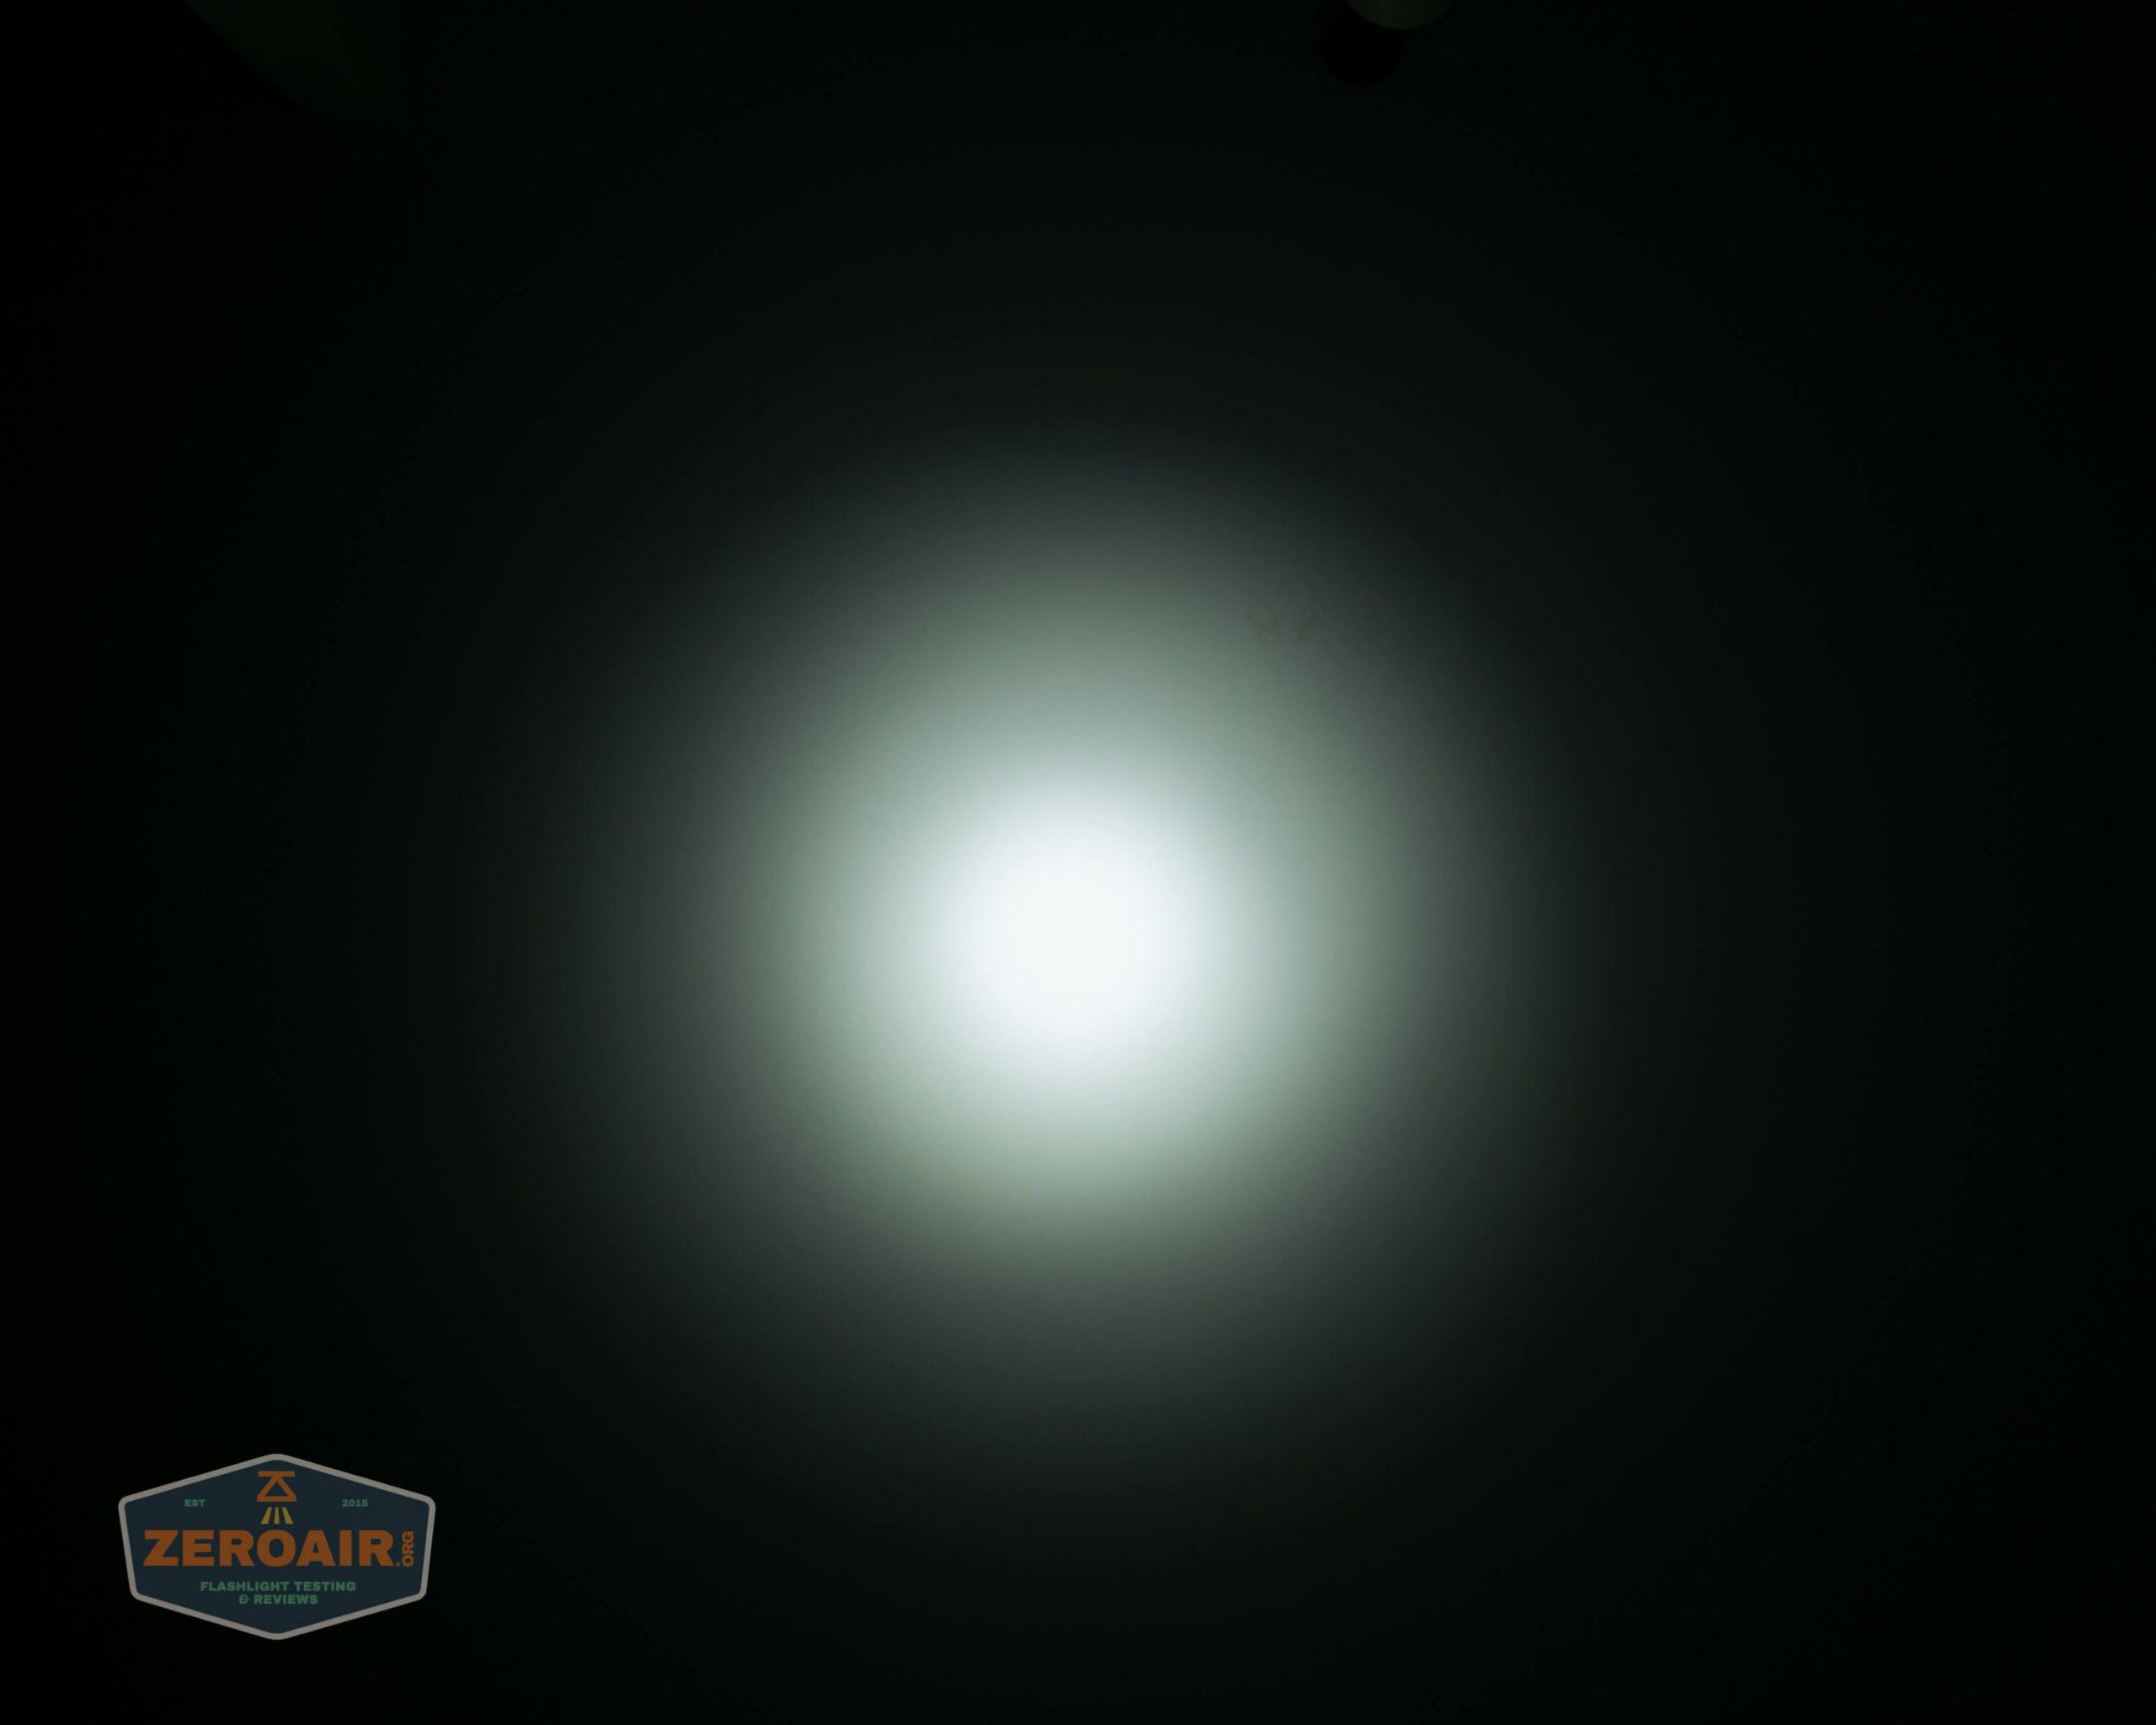 fireflylite e01 luminus sst-40 21700 beamshot ceiling 4